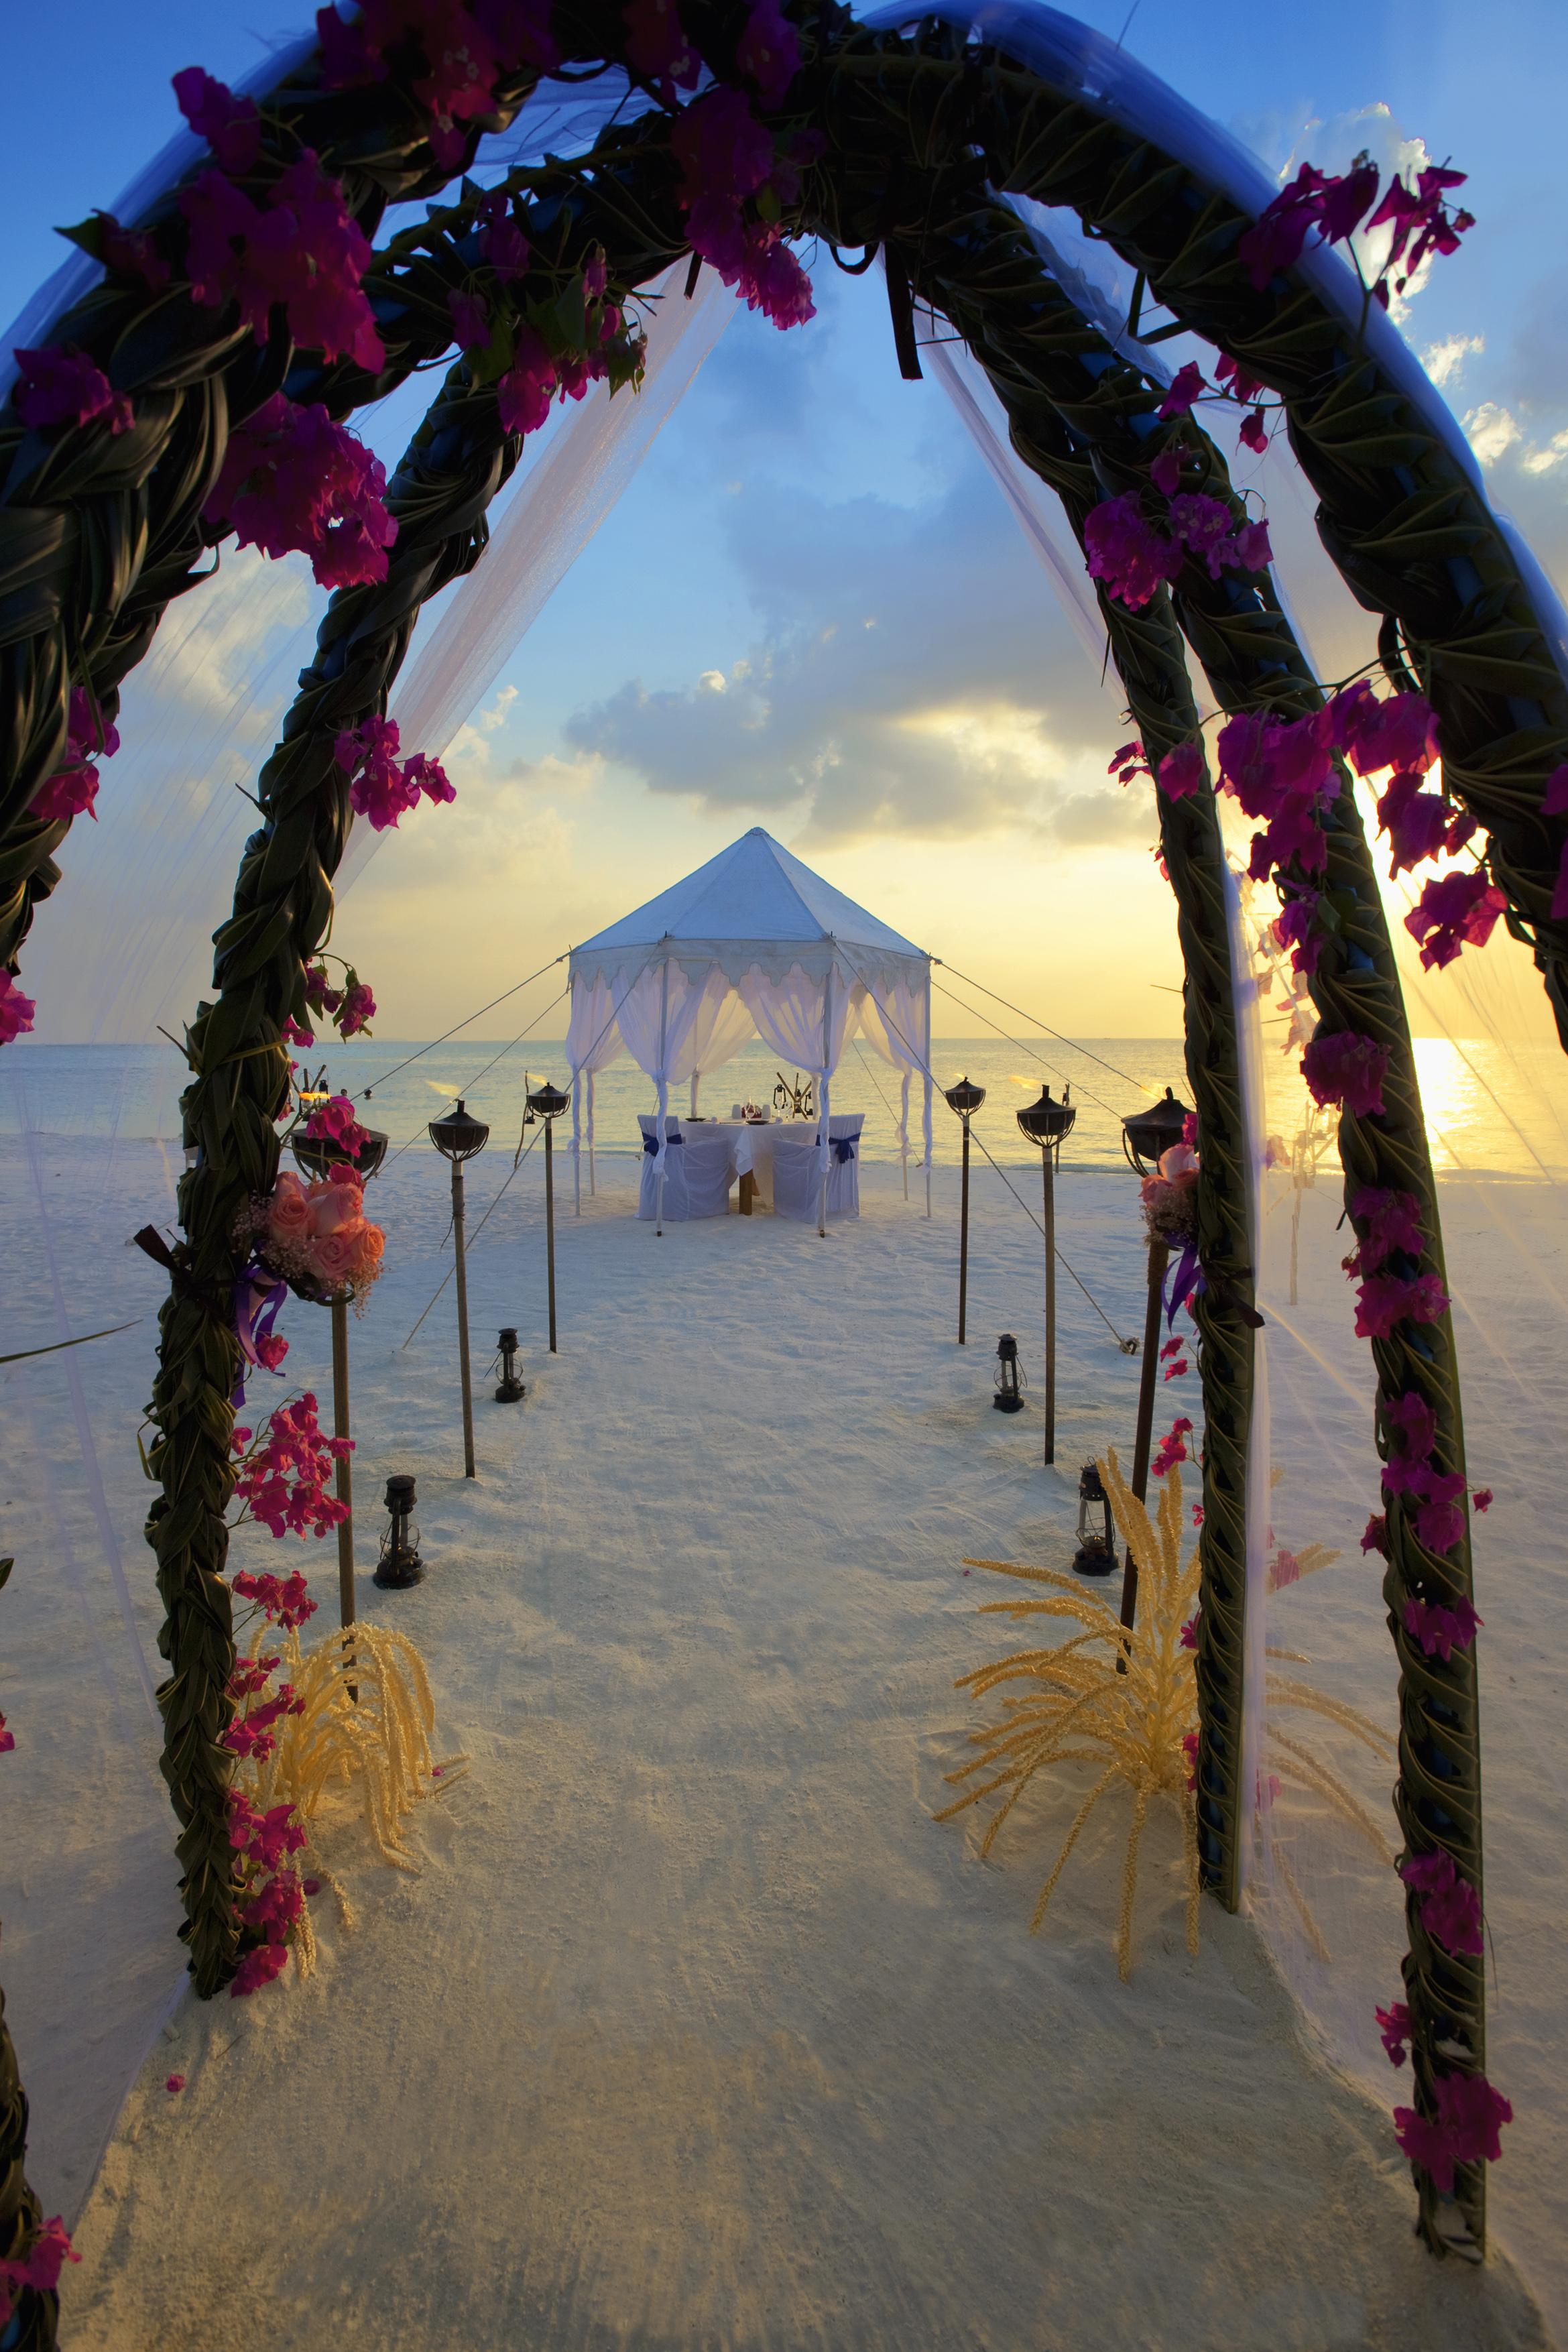 Anantara Dhigu Resort en South Male Atoll